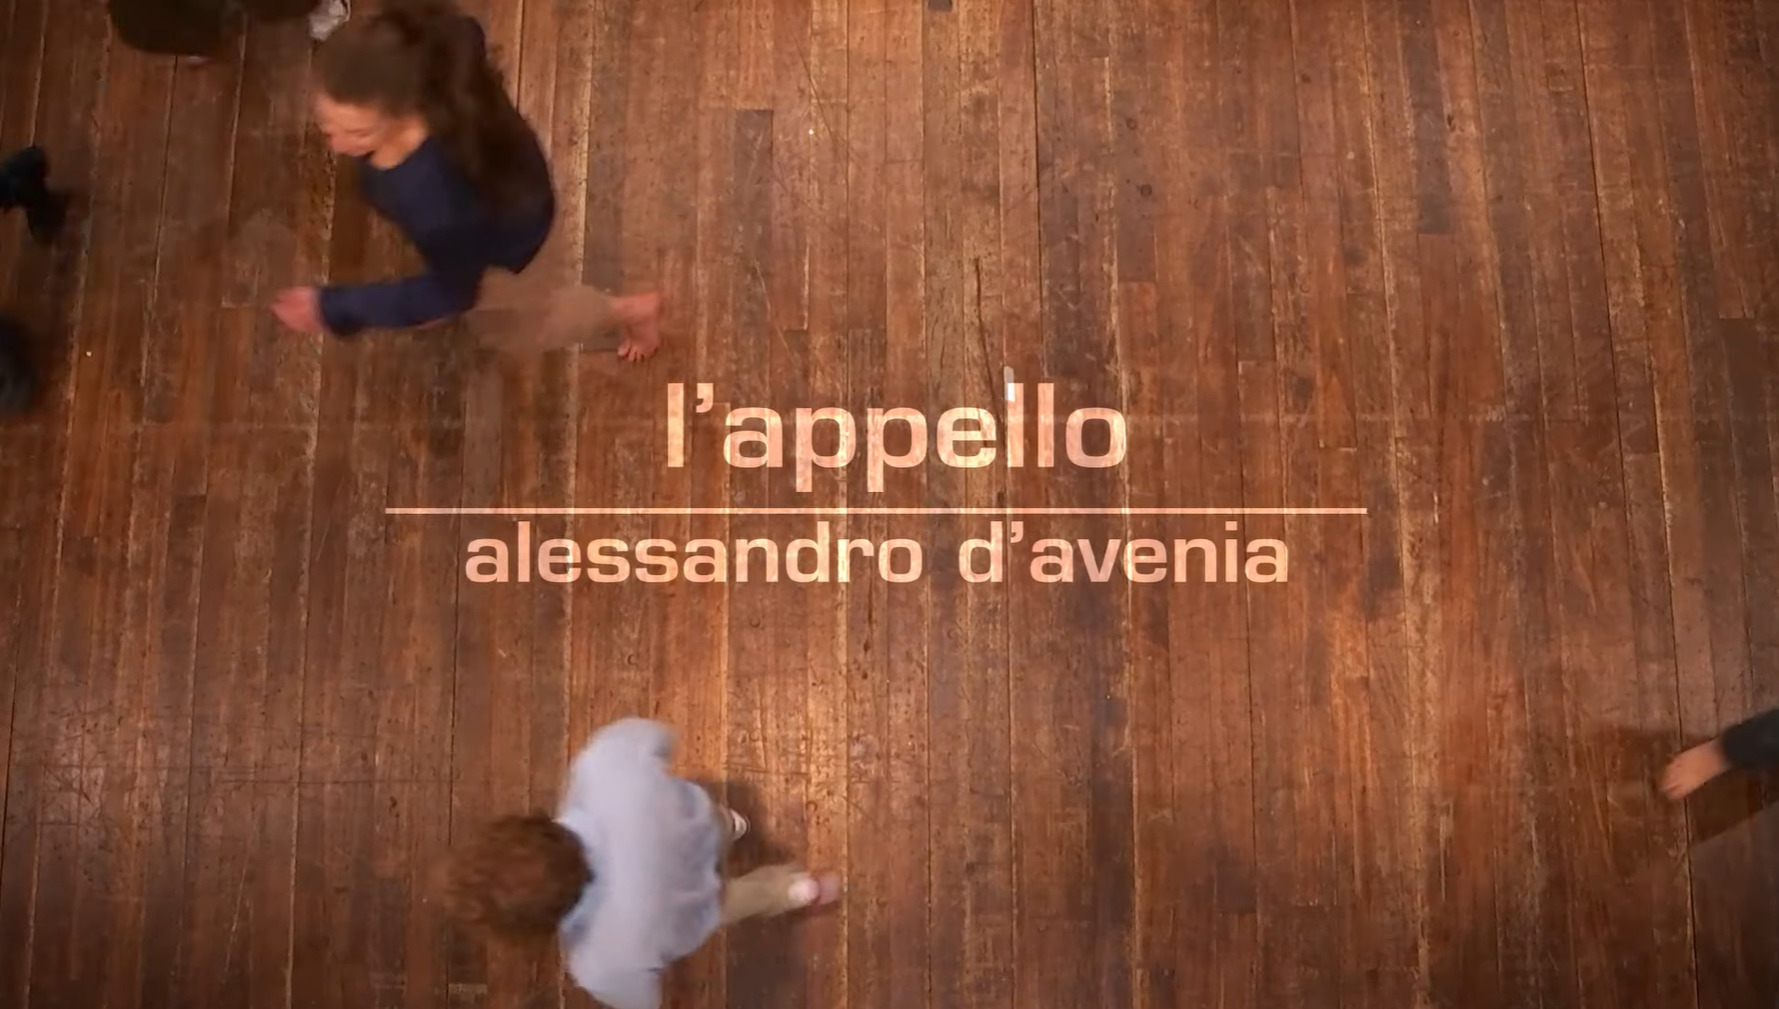 L'Appello, Alessandro D'Avenia Opening Credits: YouTube